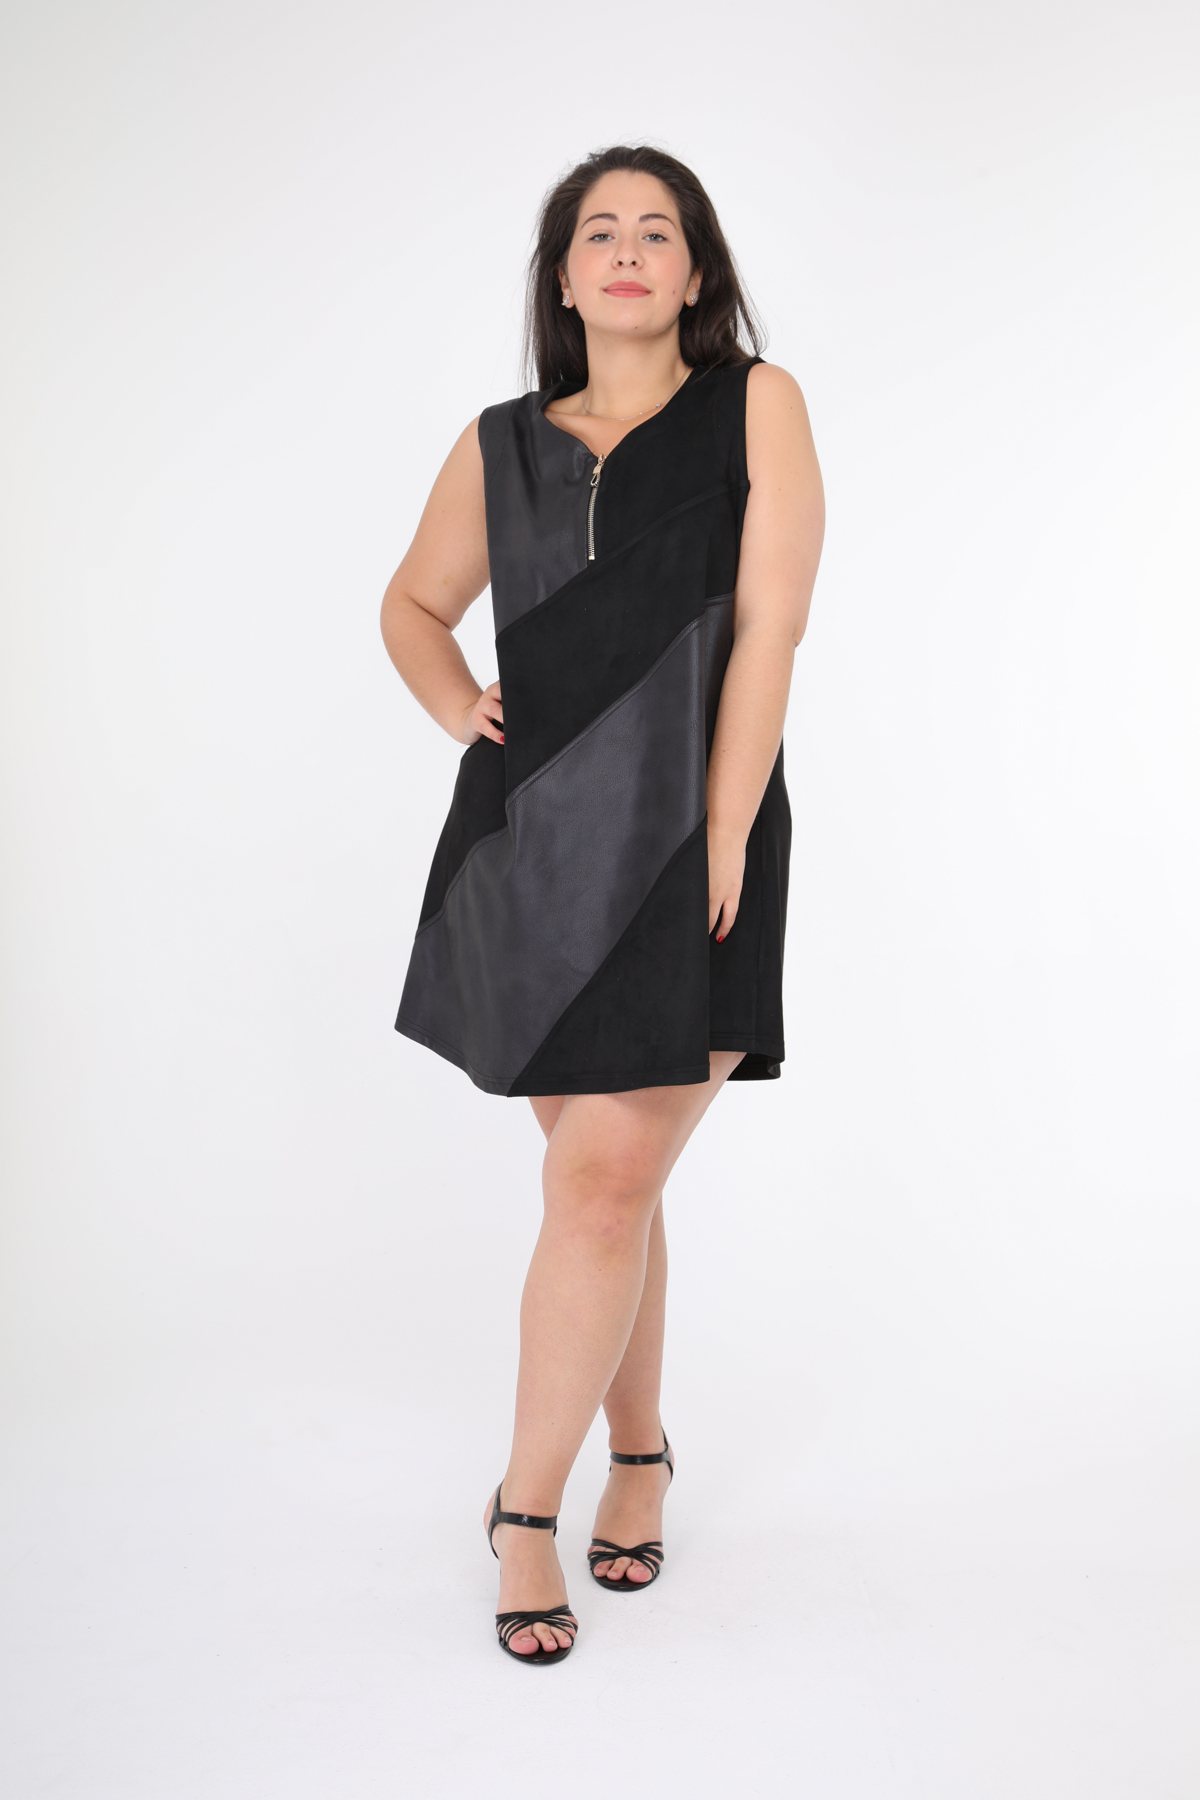 robe grande taille femme 2W PARIS r1257 noir 46-60